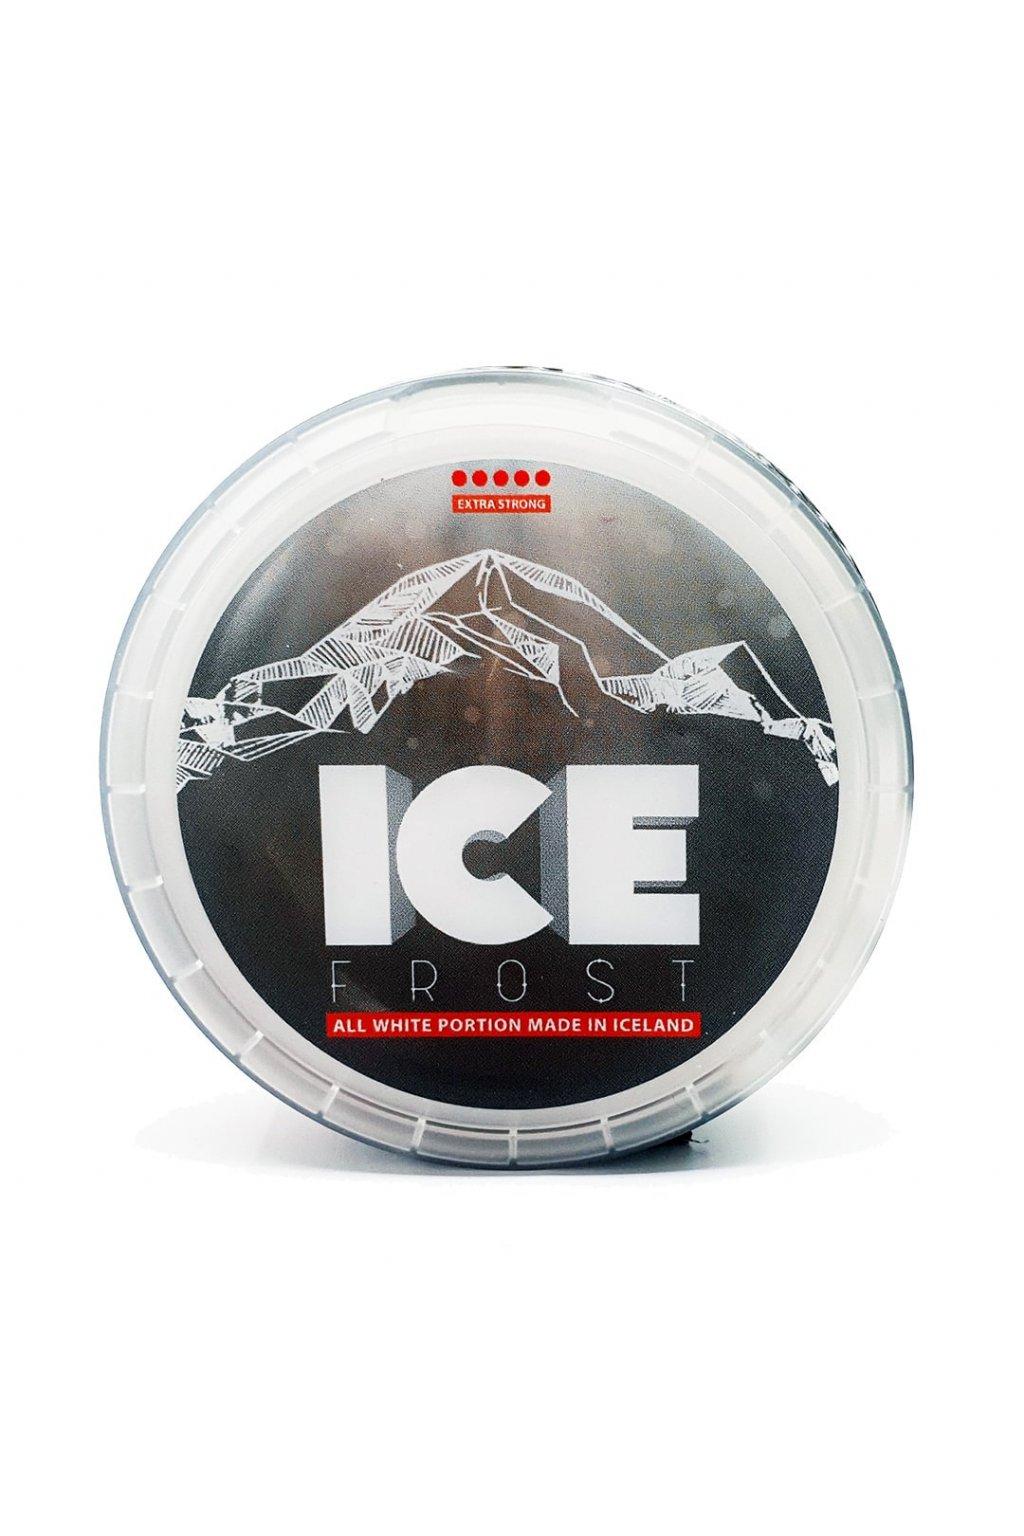 Ice frost nikotinove sacky nicopods nordiction min